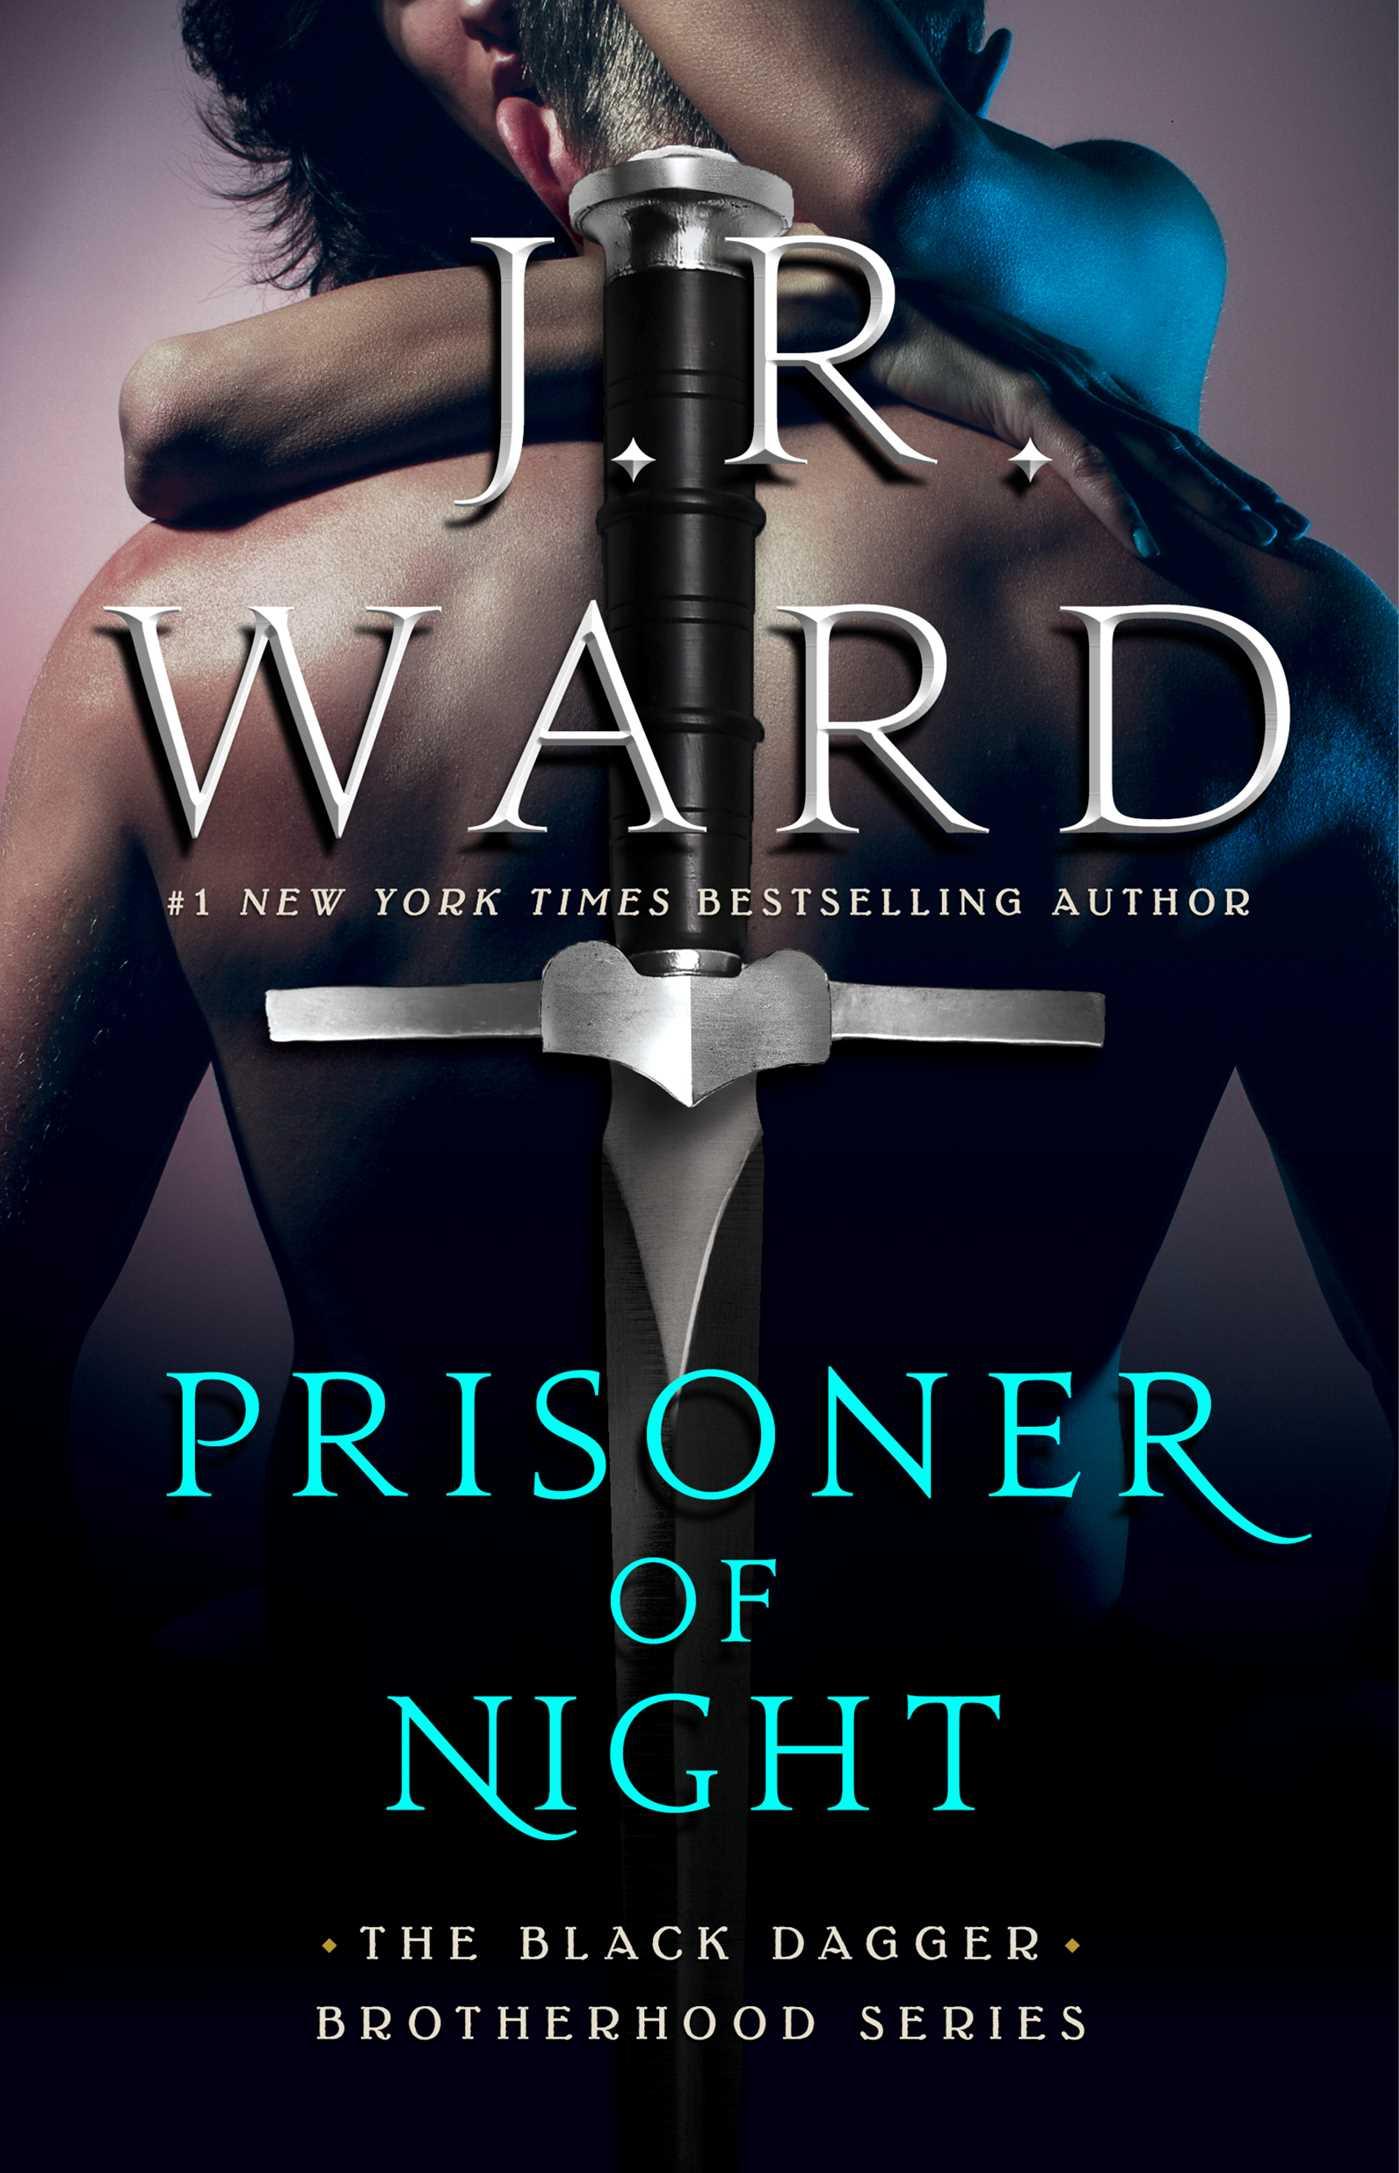 Cover Image of Prisoner of Night